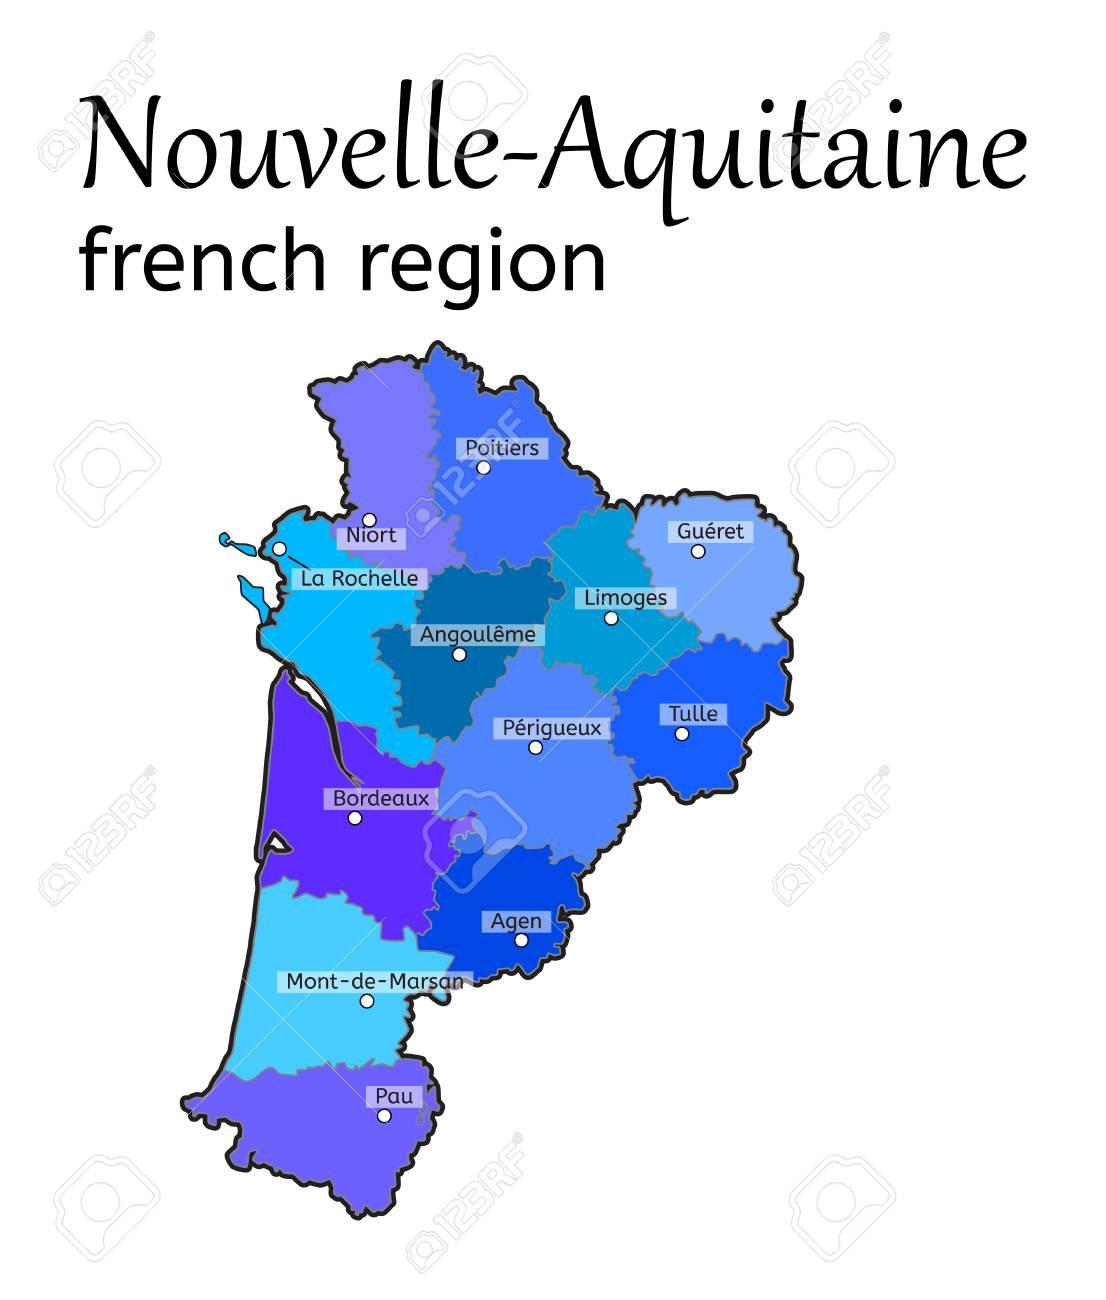 Nouvelle-Aquitaine French Region Map On White In Vector intérieur Nouvelle Region France